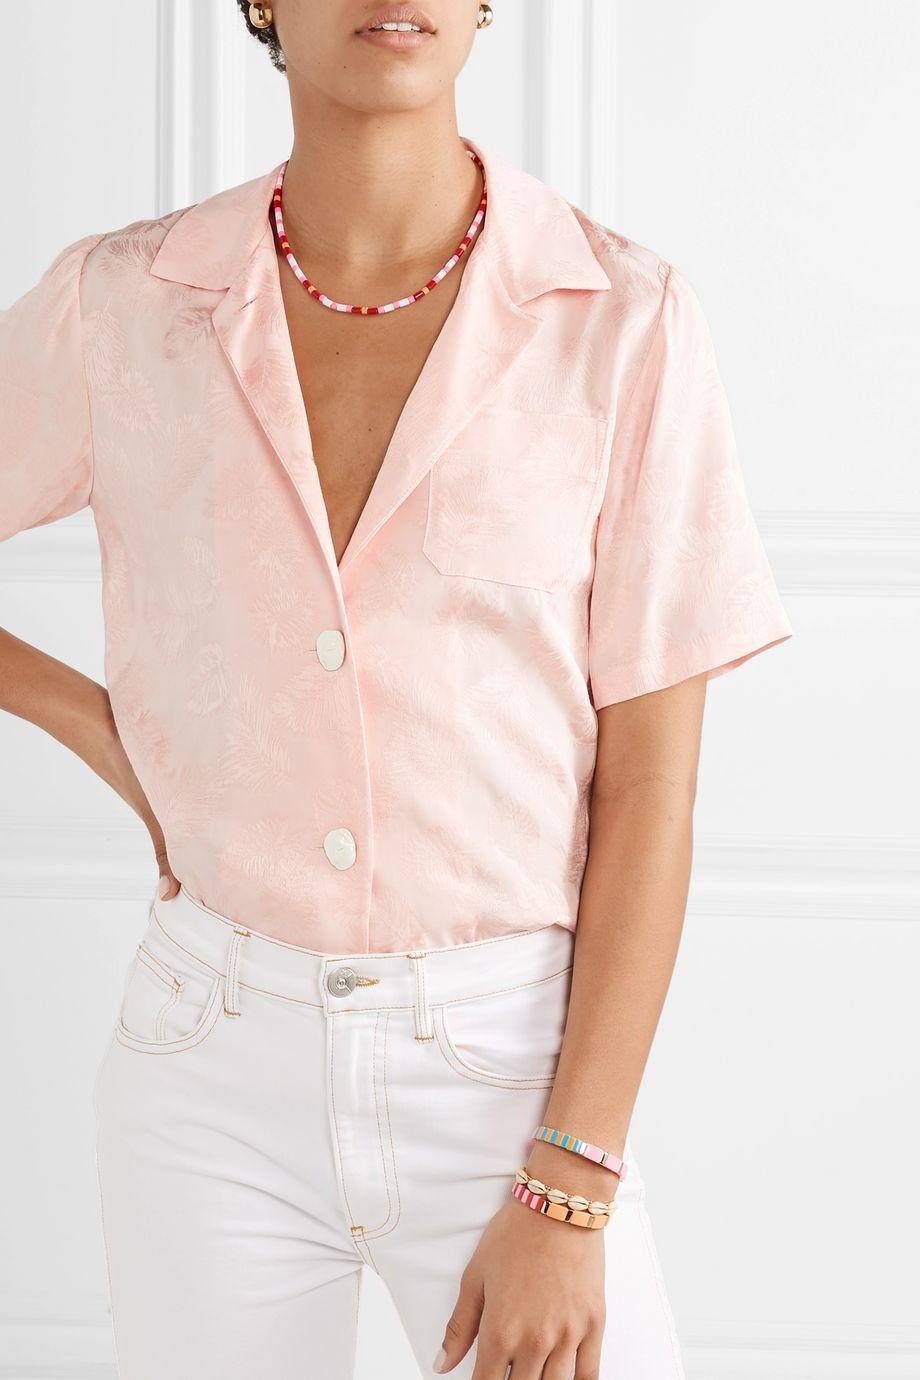 Roxanne Assoulin Hibiscus enamel necklace